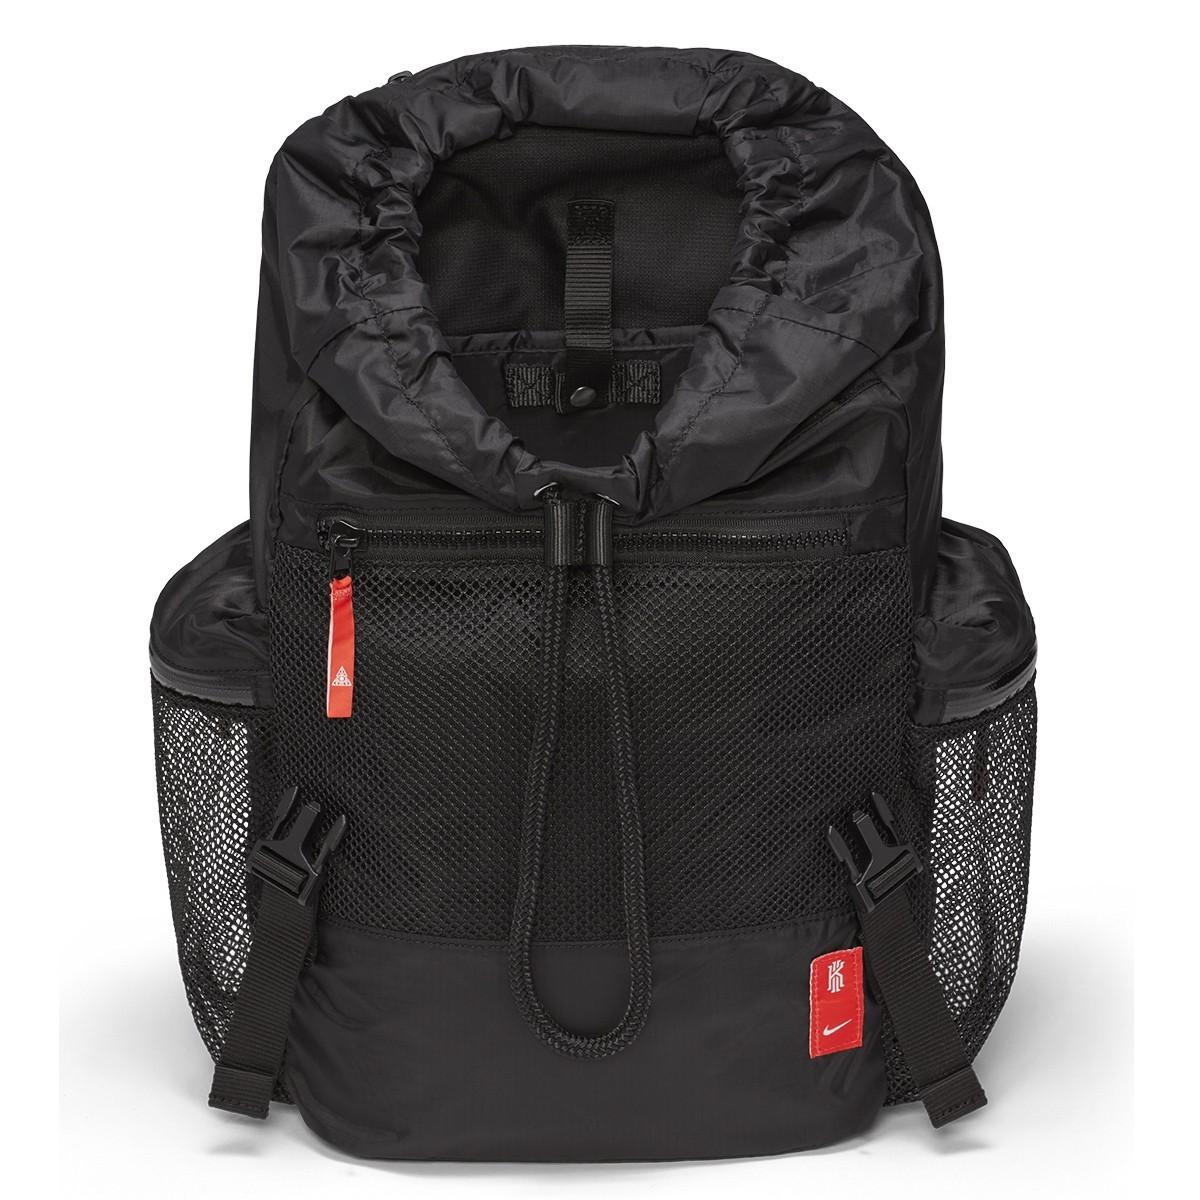 Mochila Nike Kyrie Irving Rucksack 'Black'-CU3939-010